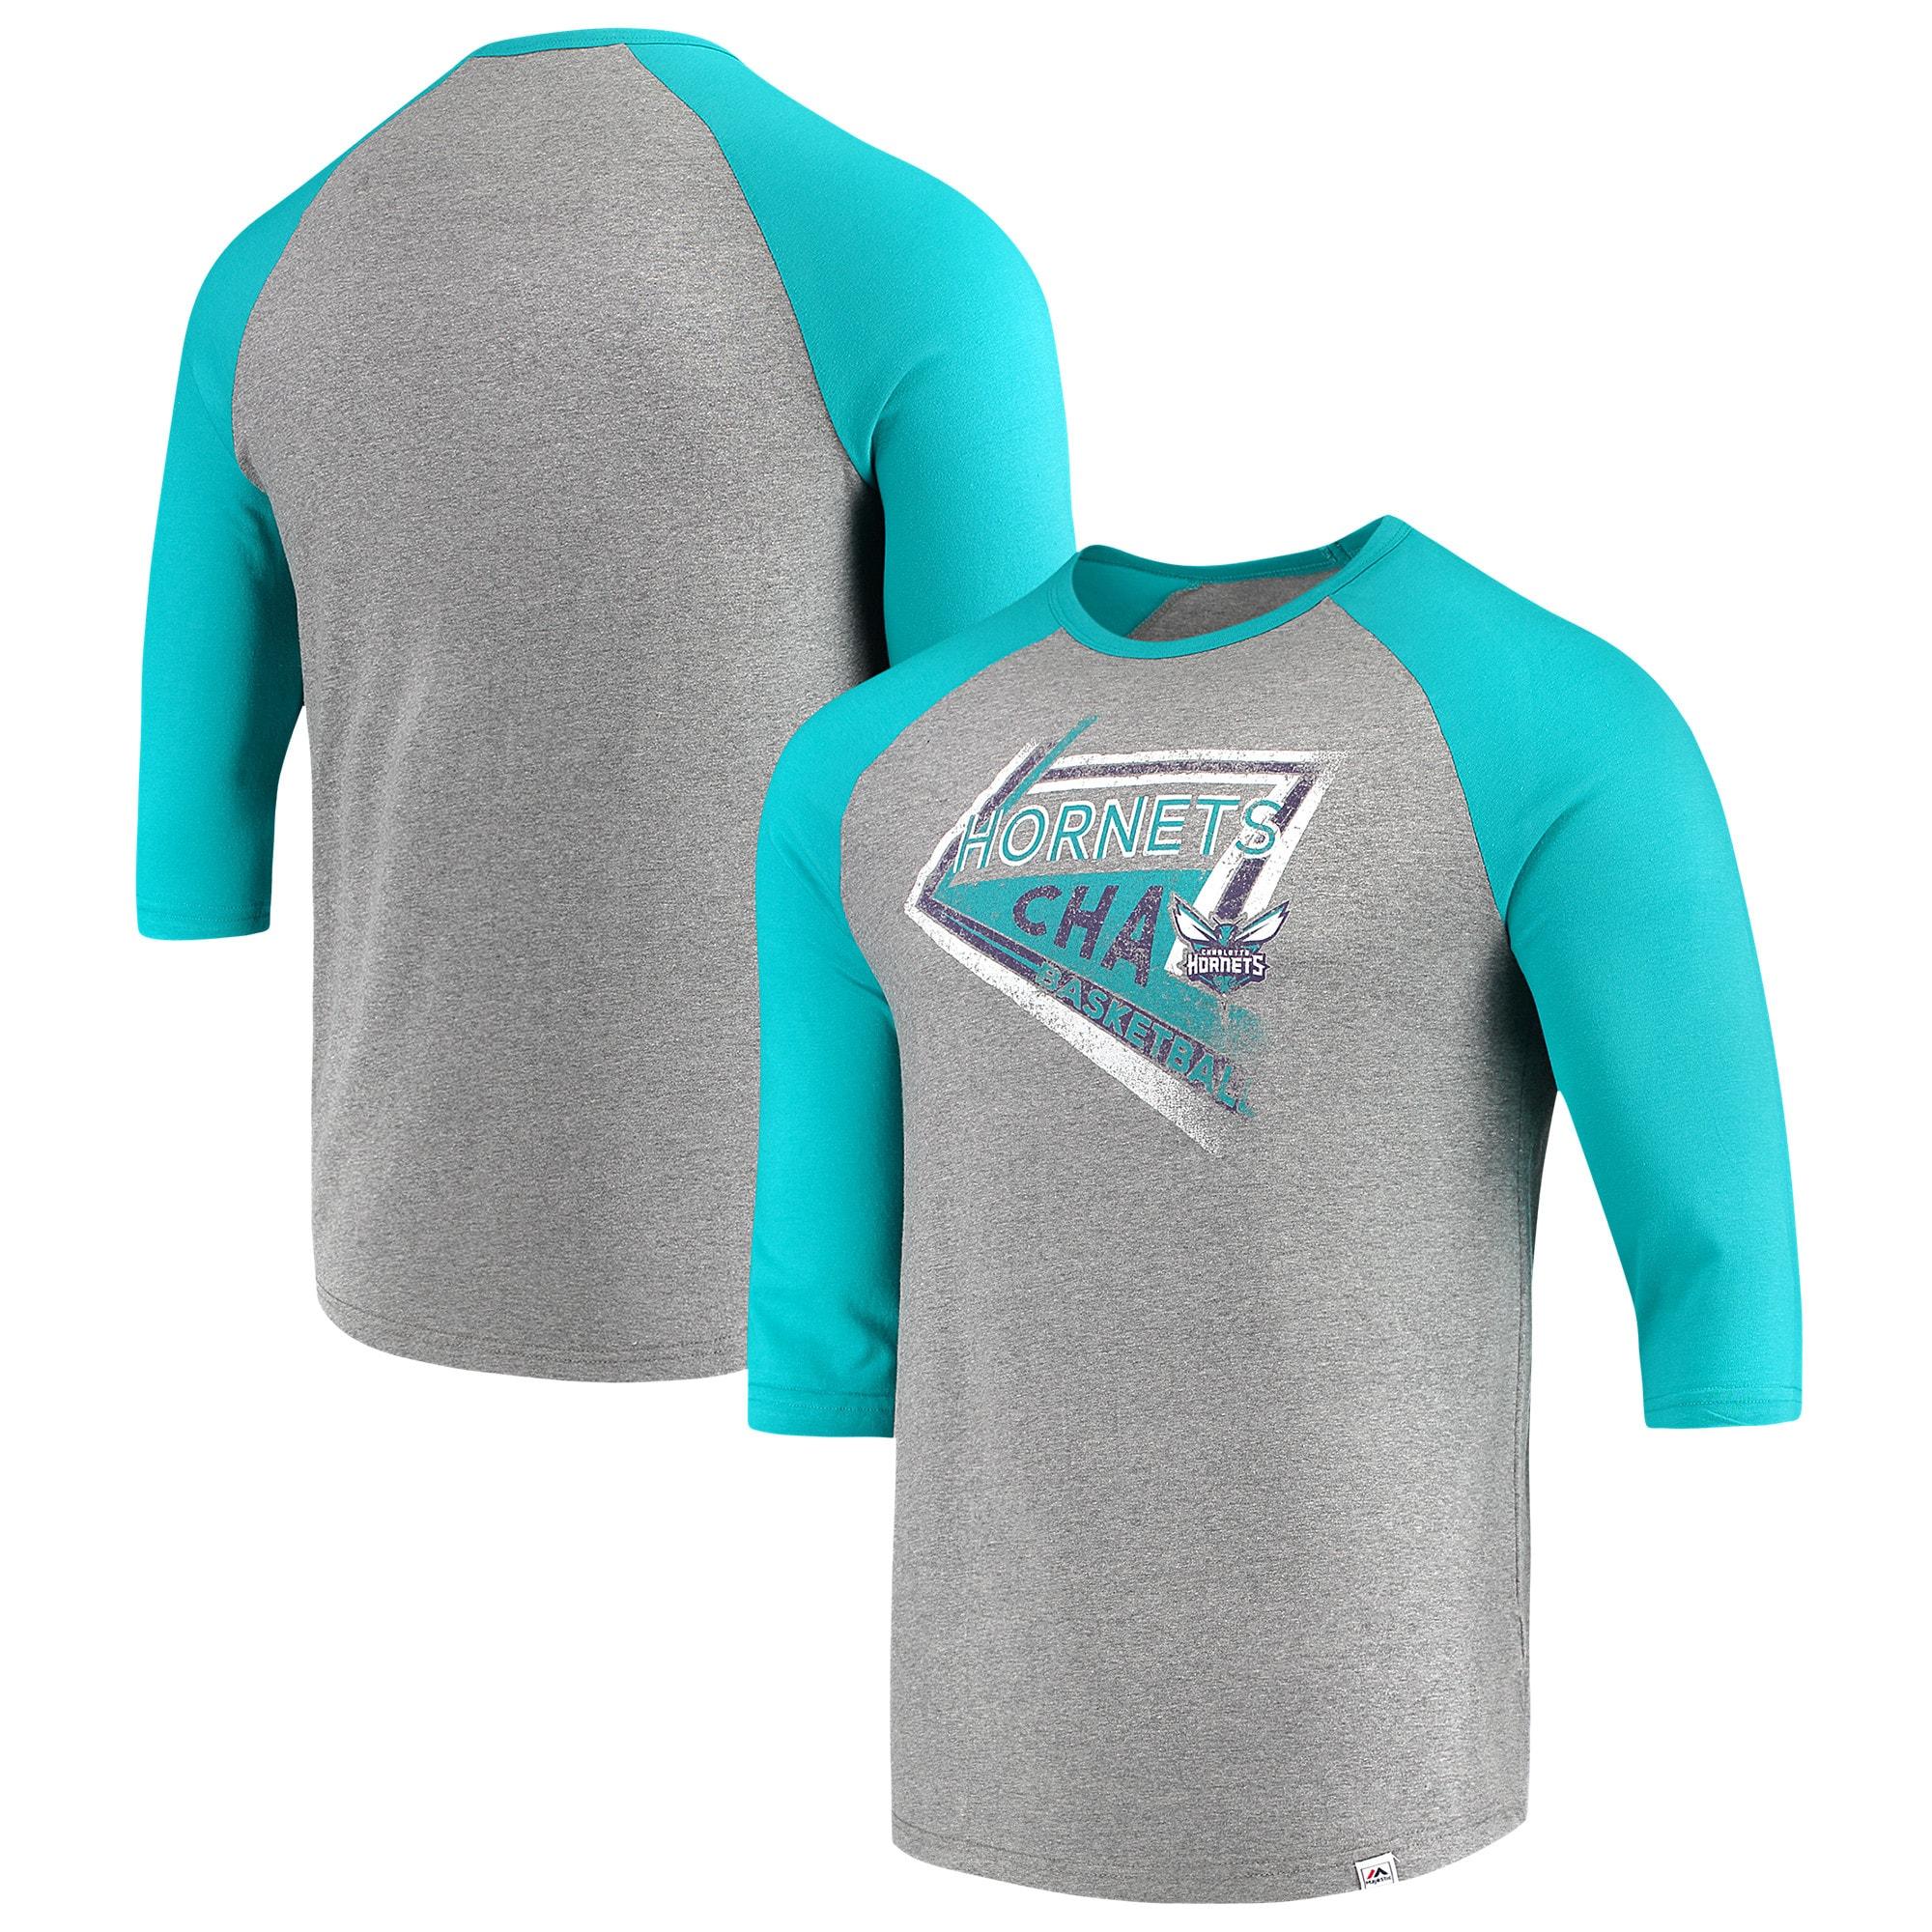 Charlotte Hornets Majestic Scoring Position Tri-Blend 3/4-Sleeve Raglan T-Shirt - Heathered Gray/Teal